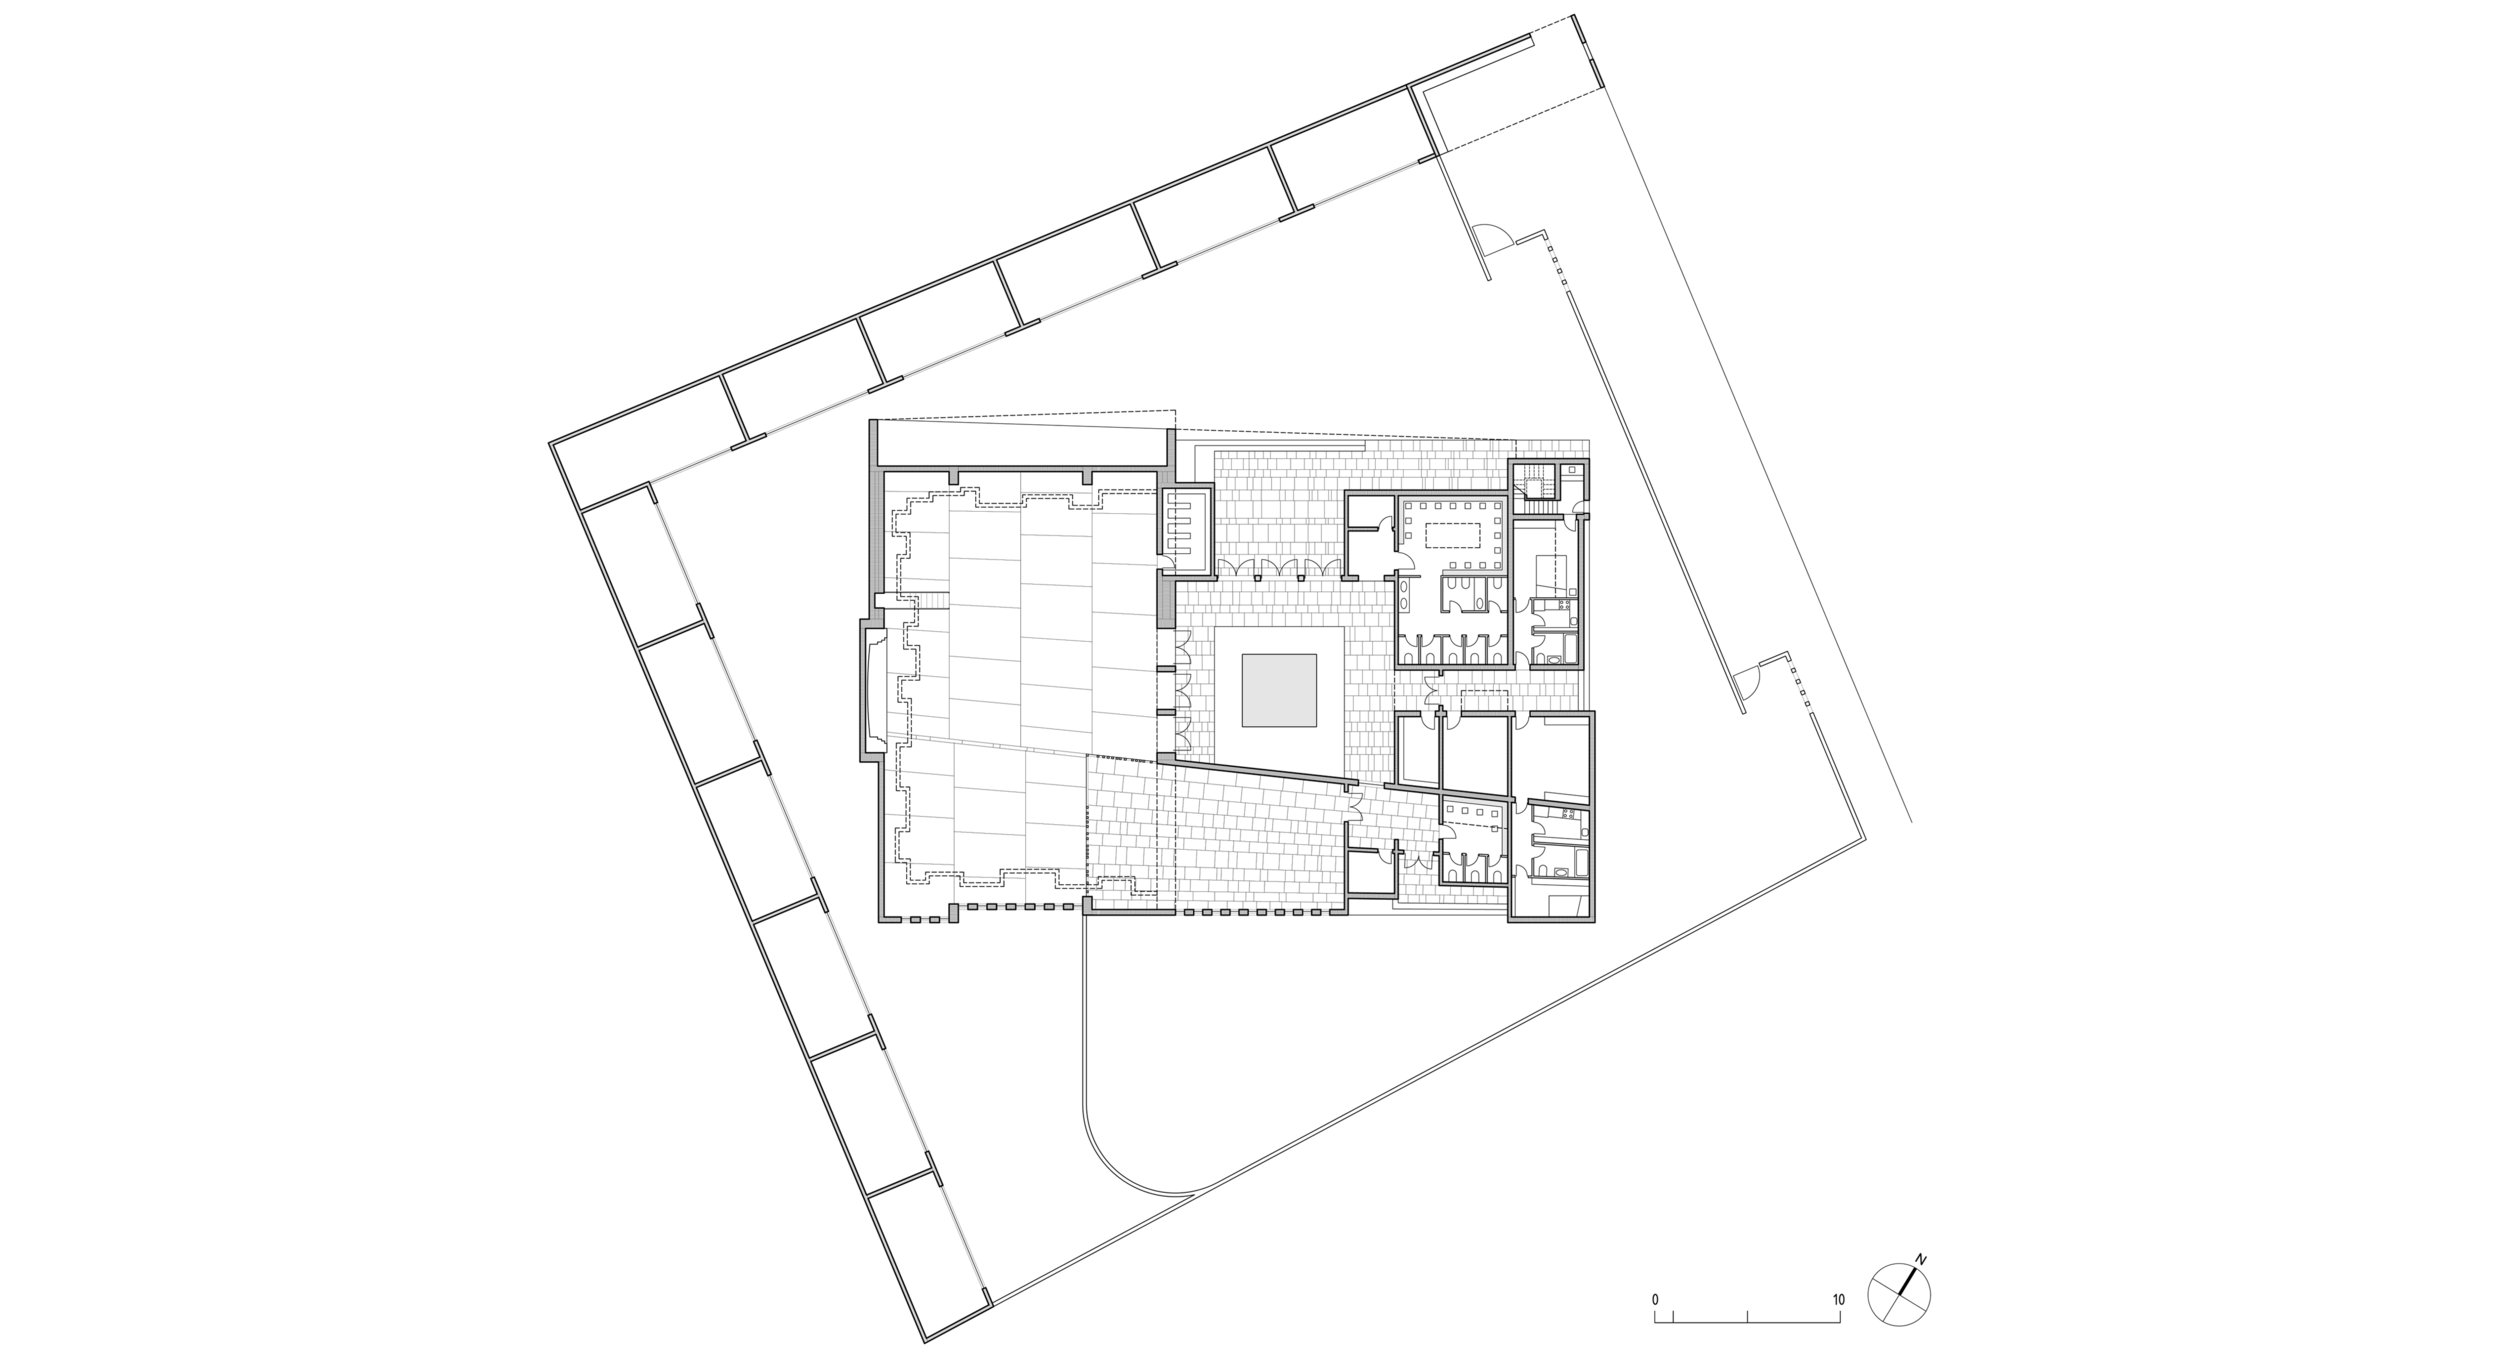 mosque-plan-site-01.jpg